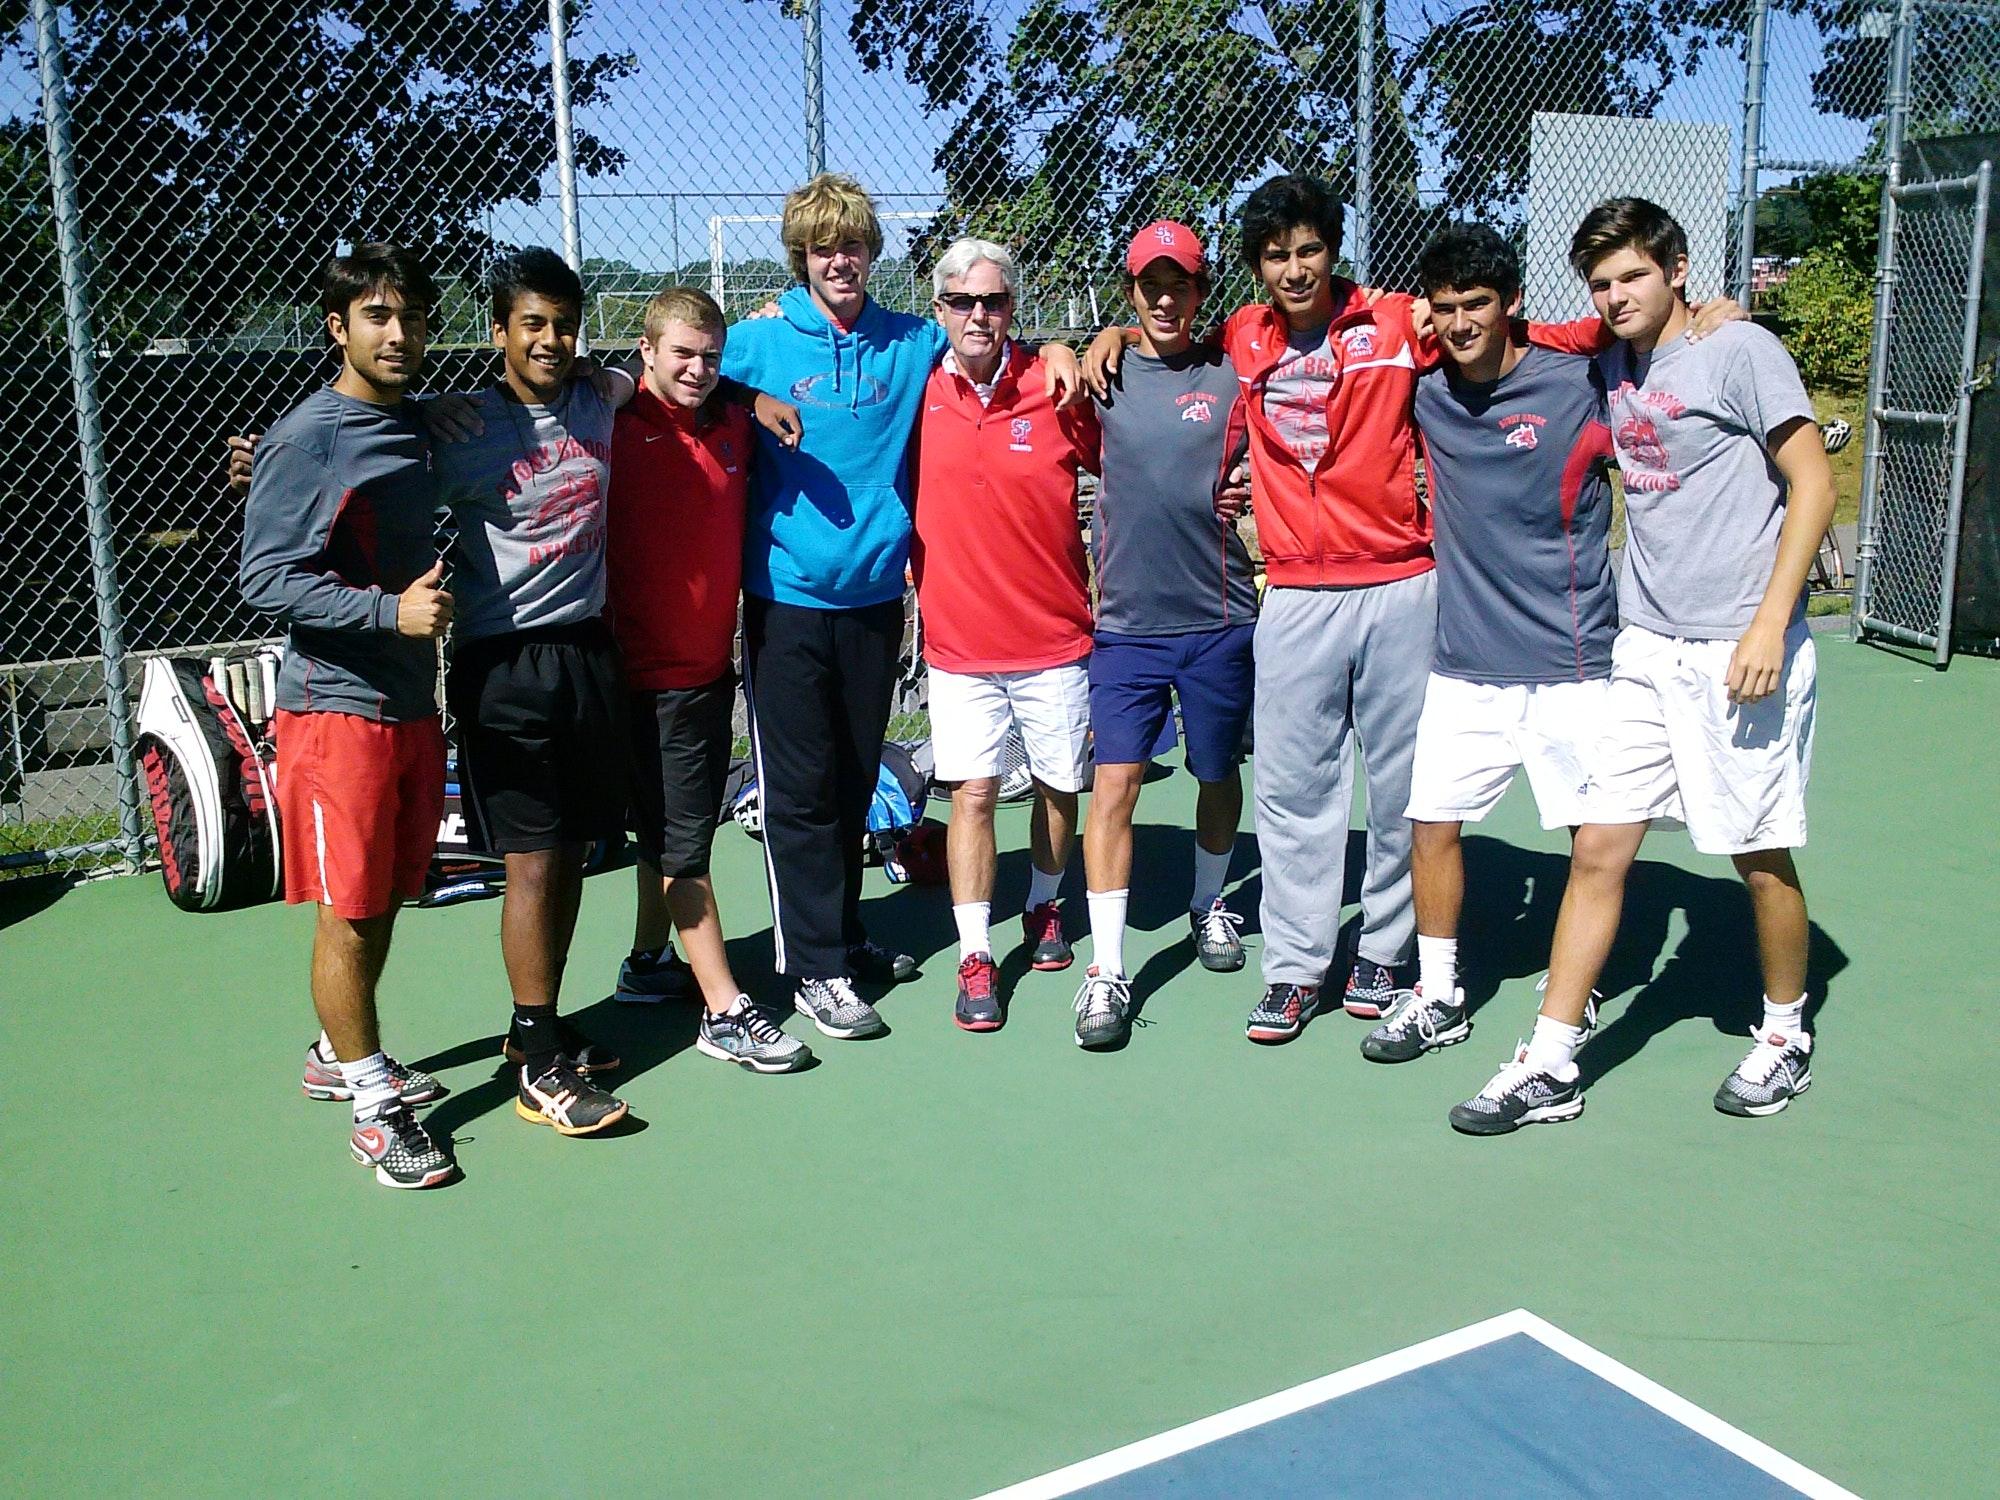 Bob C Tennis Coach In Port Jefferson Ny With